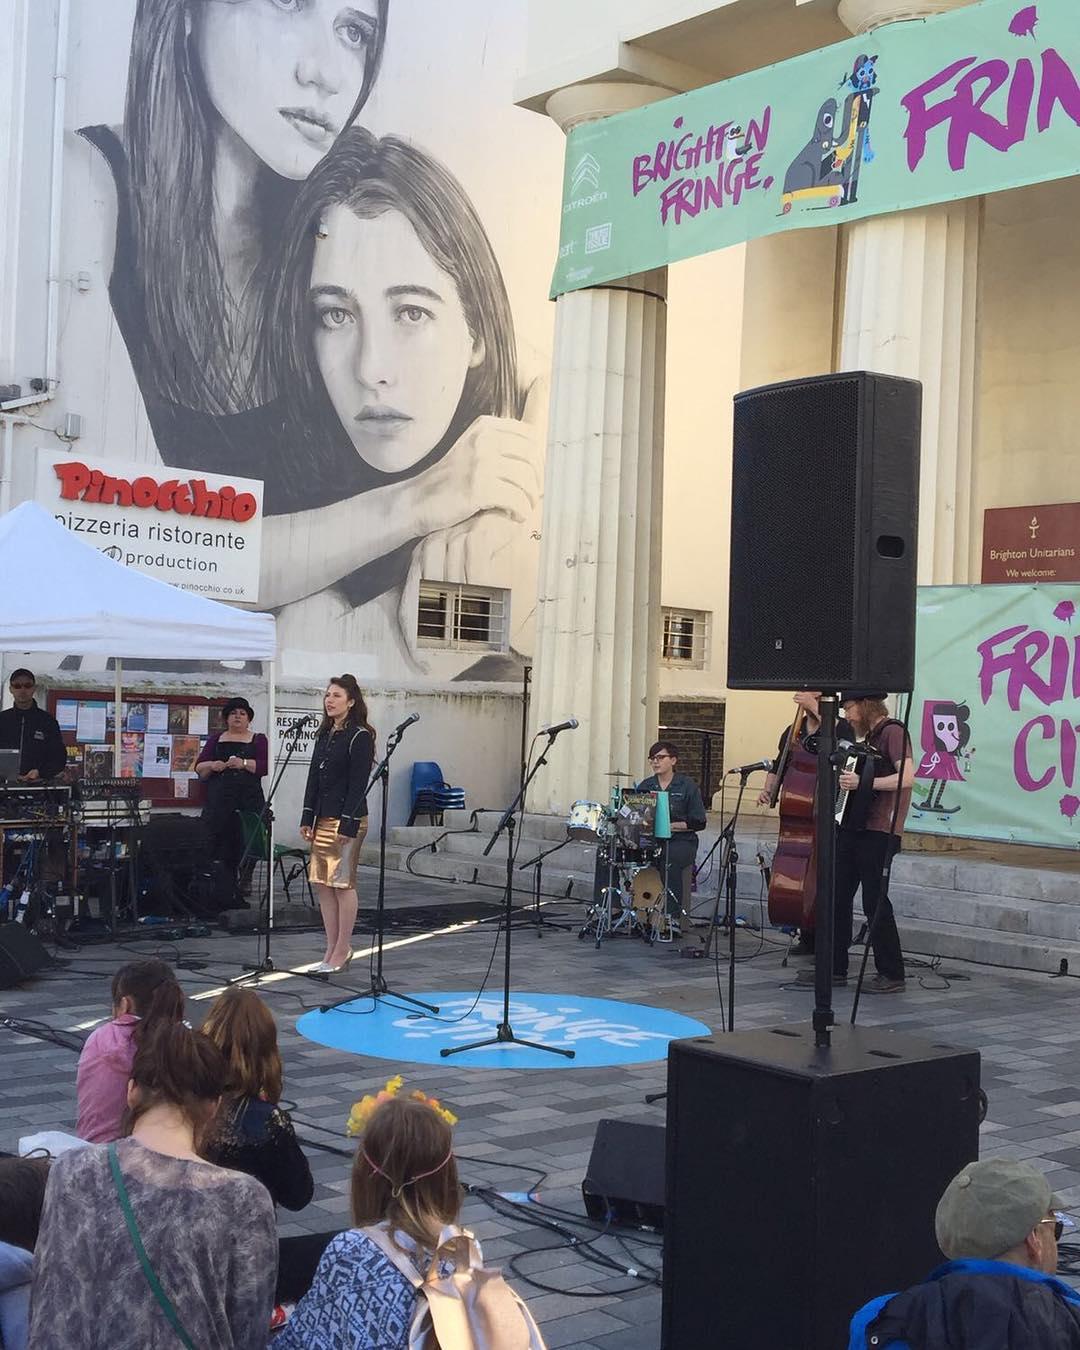 'Spokeeasy' Original cabaret play in Brighton Festival